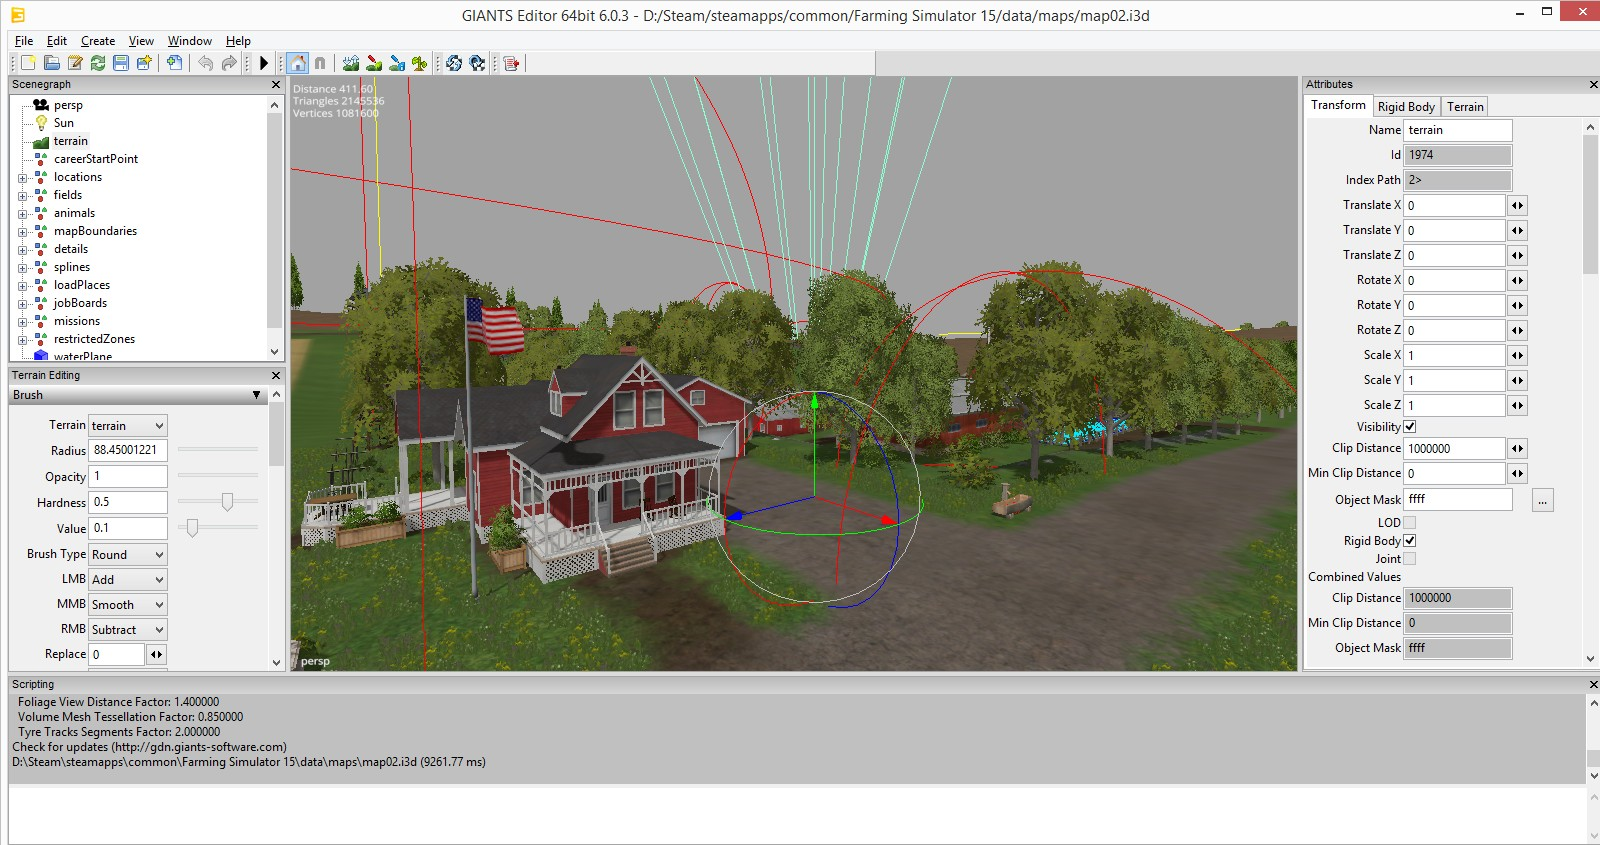 Farming Simulator 2017 Giants SDK featuring Editor 0